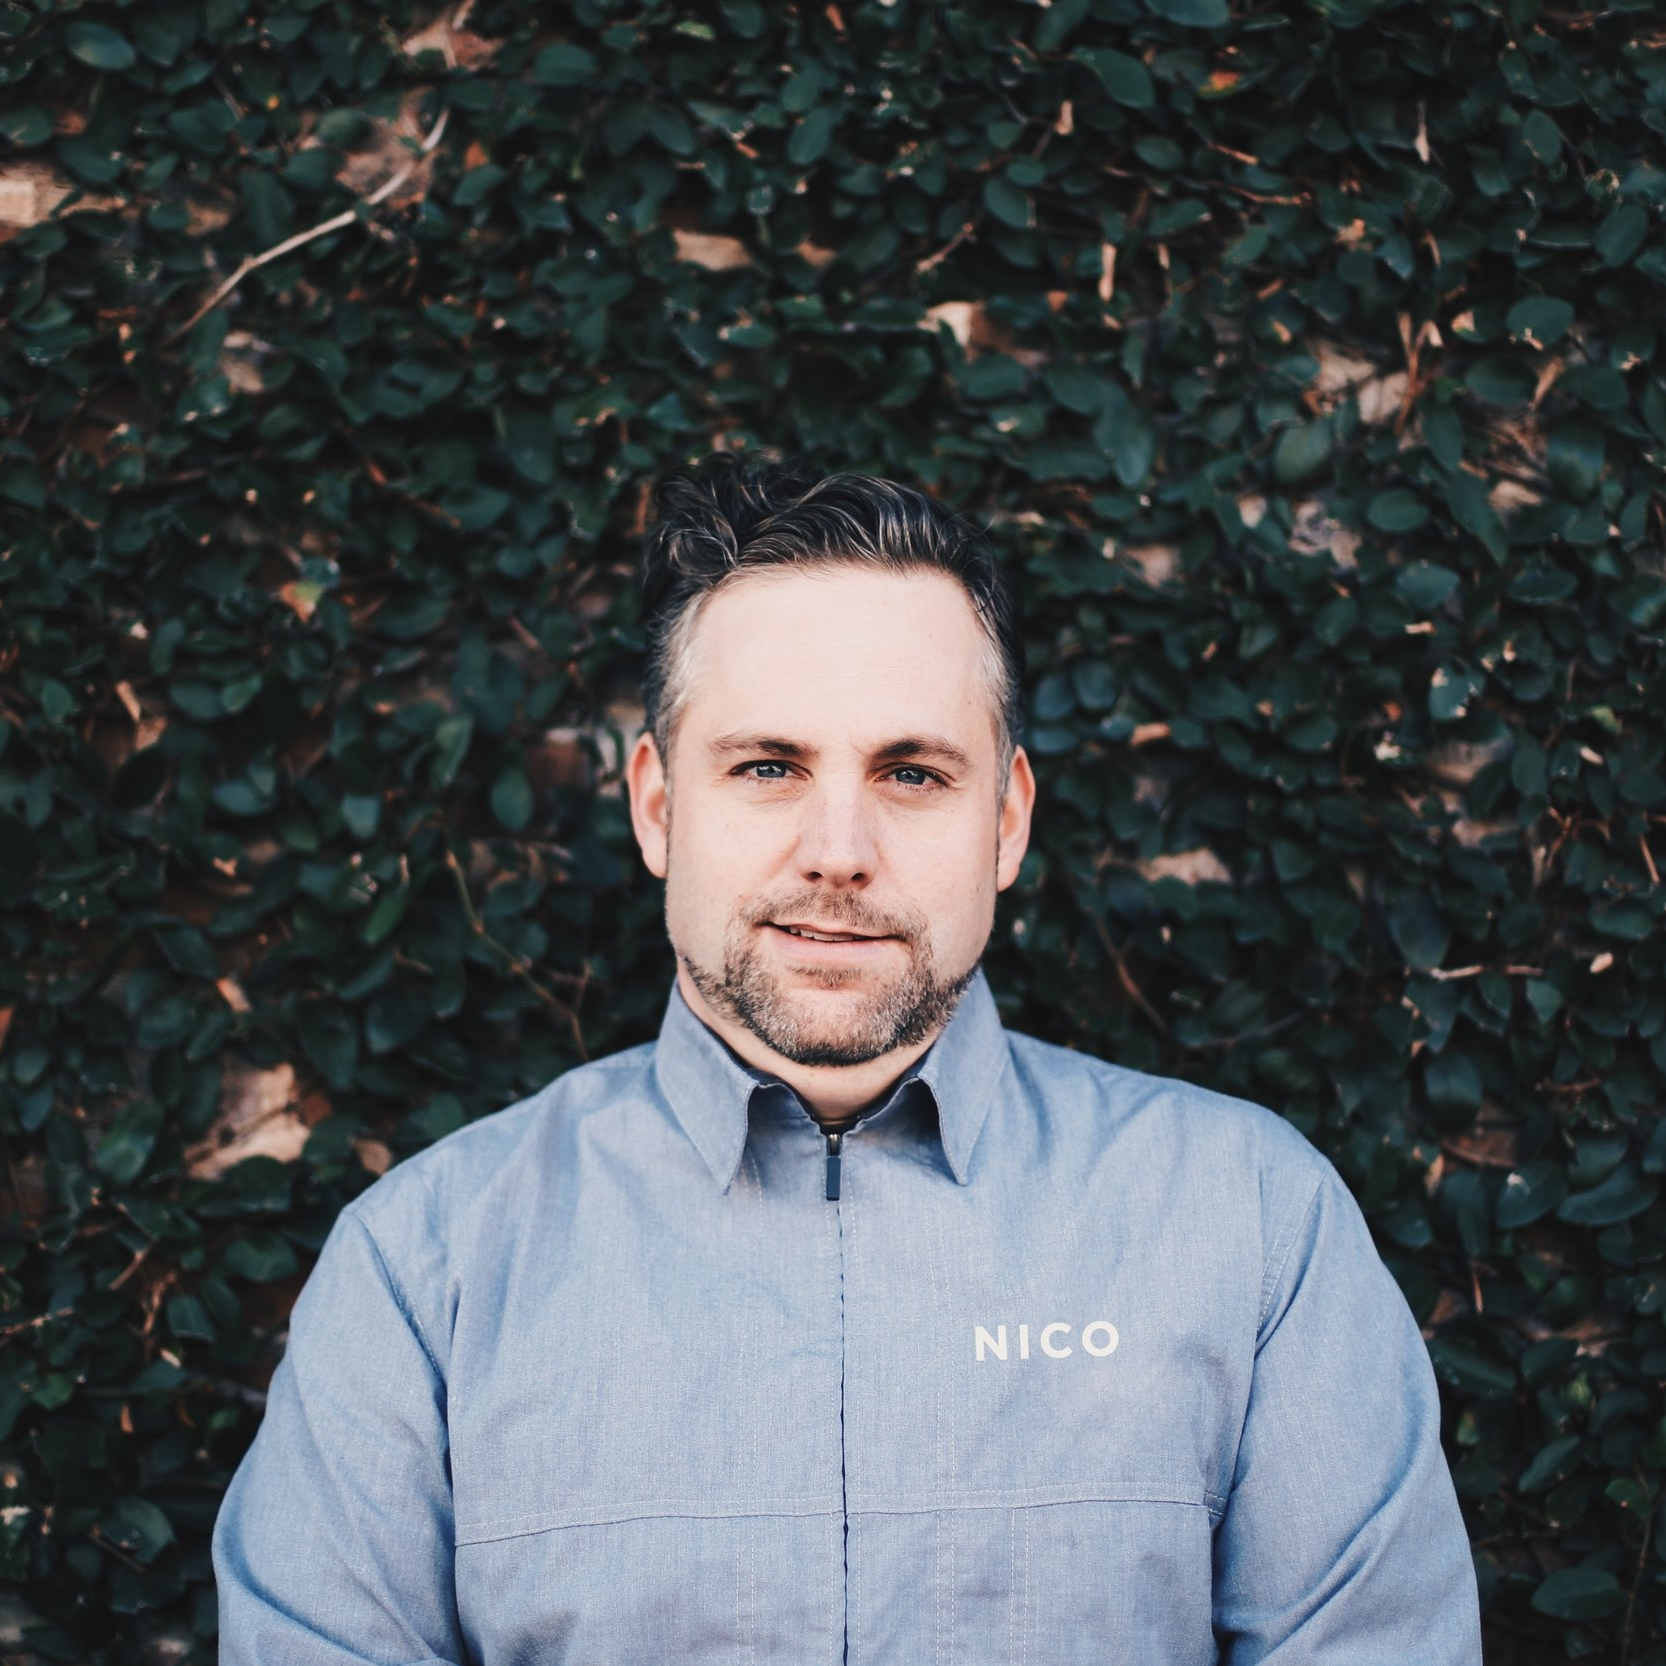 EATER CHARLESTON |Nico Romo Names New Mount Pleasant Restaurant -